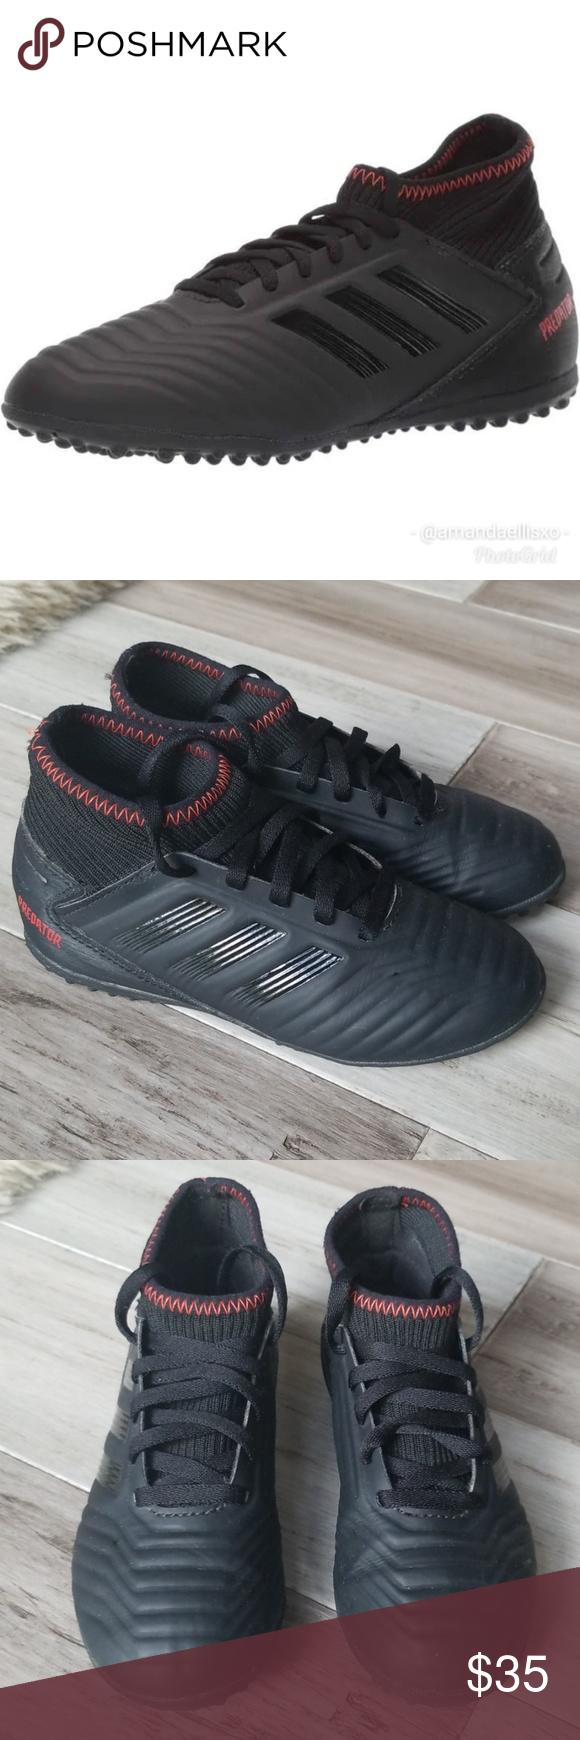 Adidas Predator 19 3 Turf Soccer Shoes Soccer Shoes Shoes Sneakers Adidas Adidas Predator